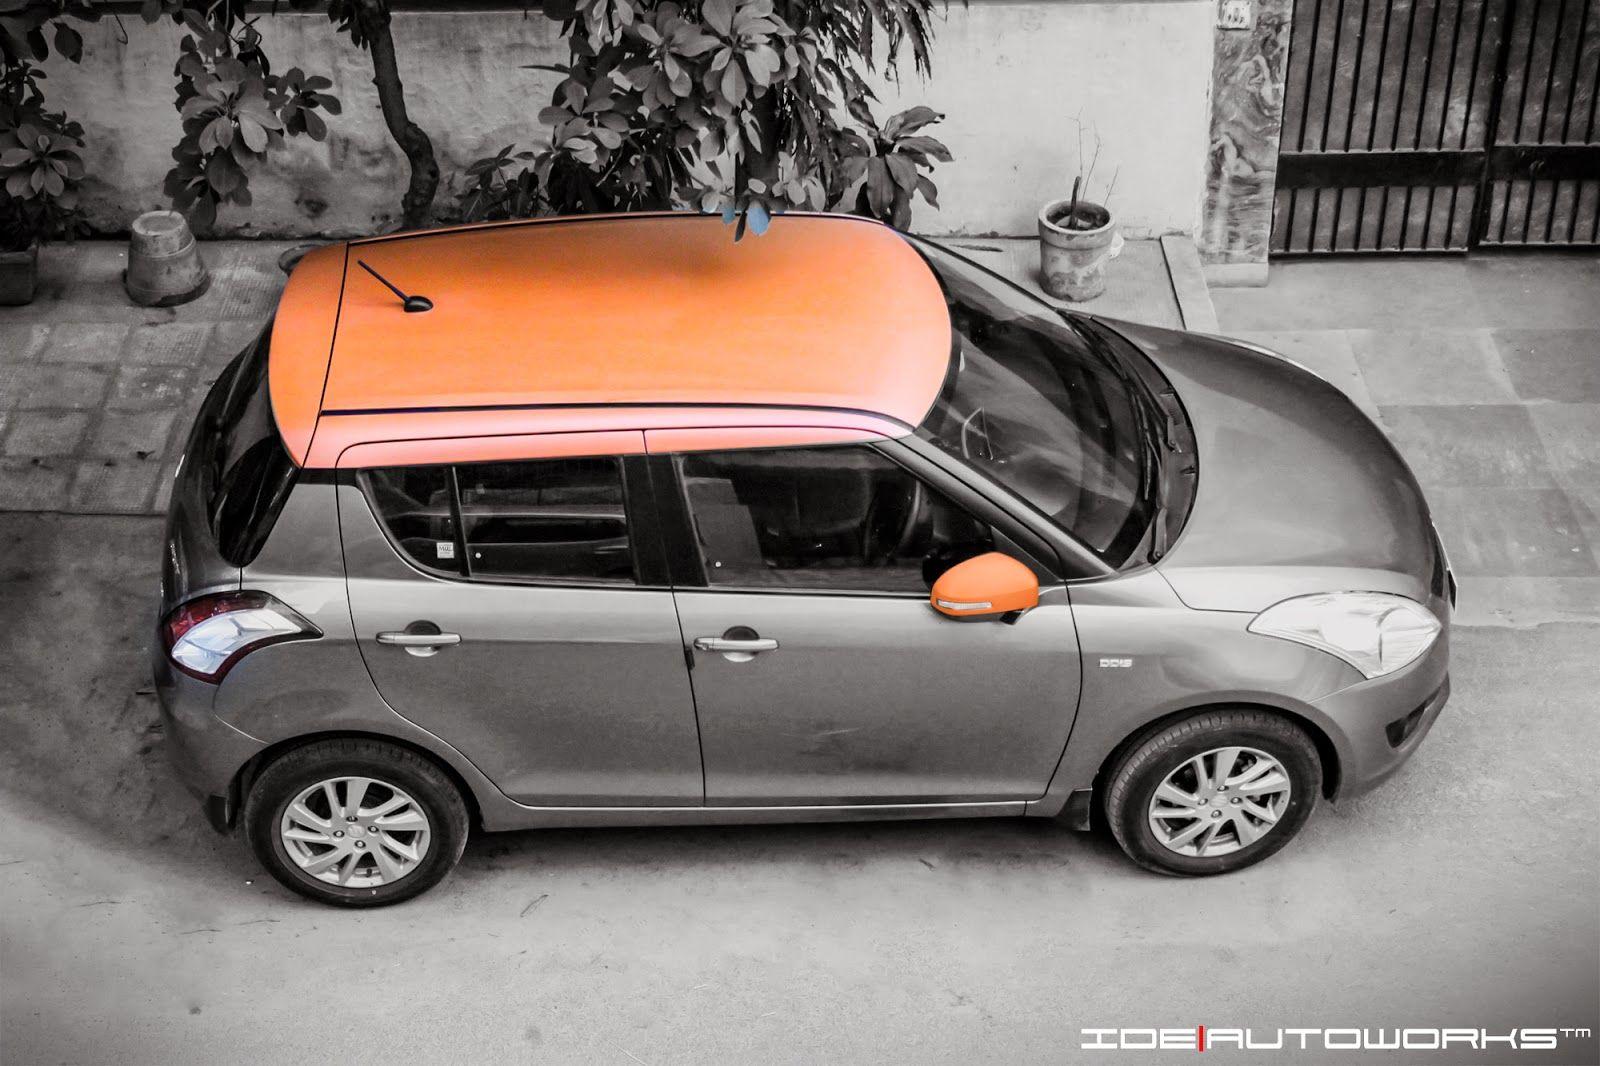 Ide Autoworks Swift With Matte Orange Roof Swift Orange Car Wrap [ 1066 x 1600 Pixel ]